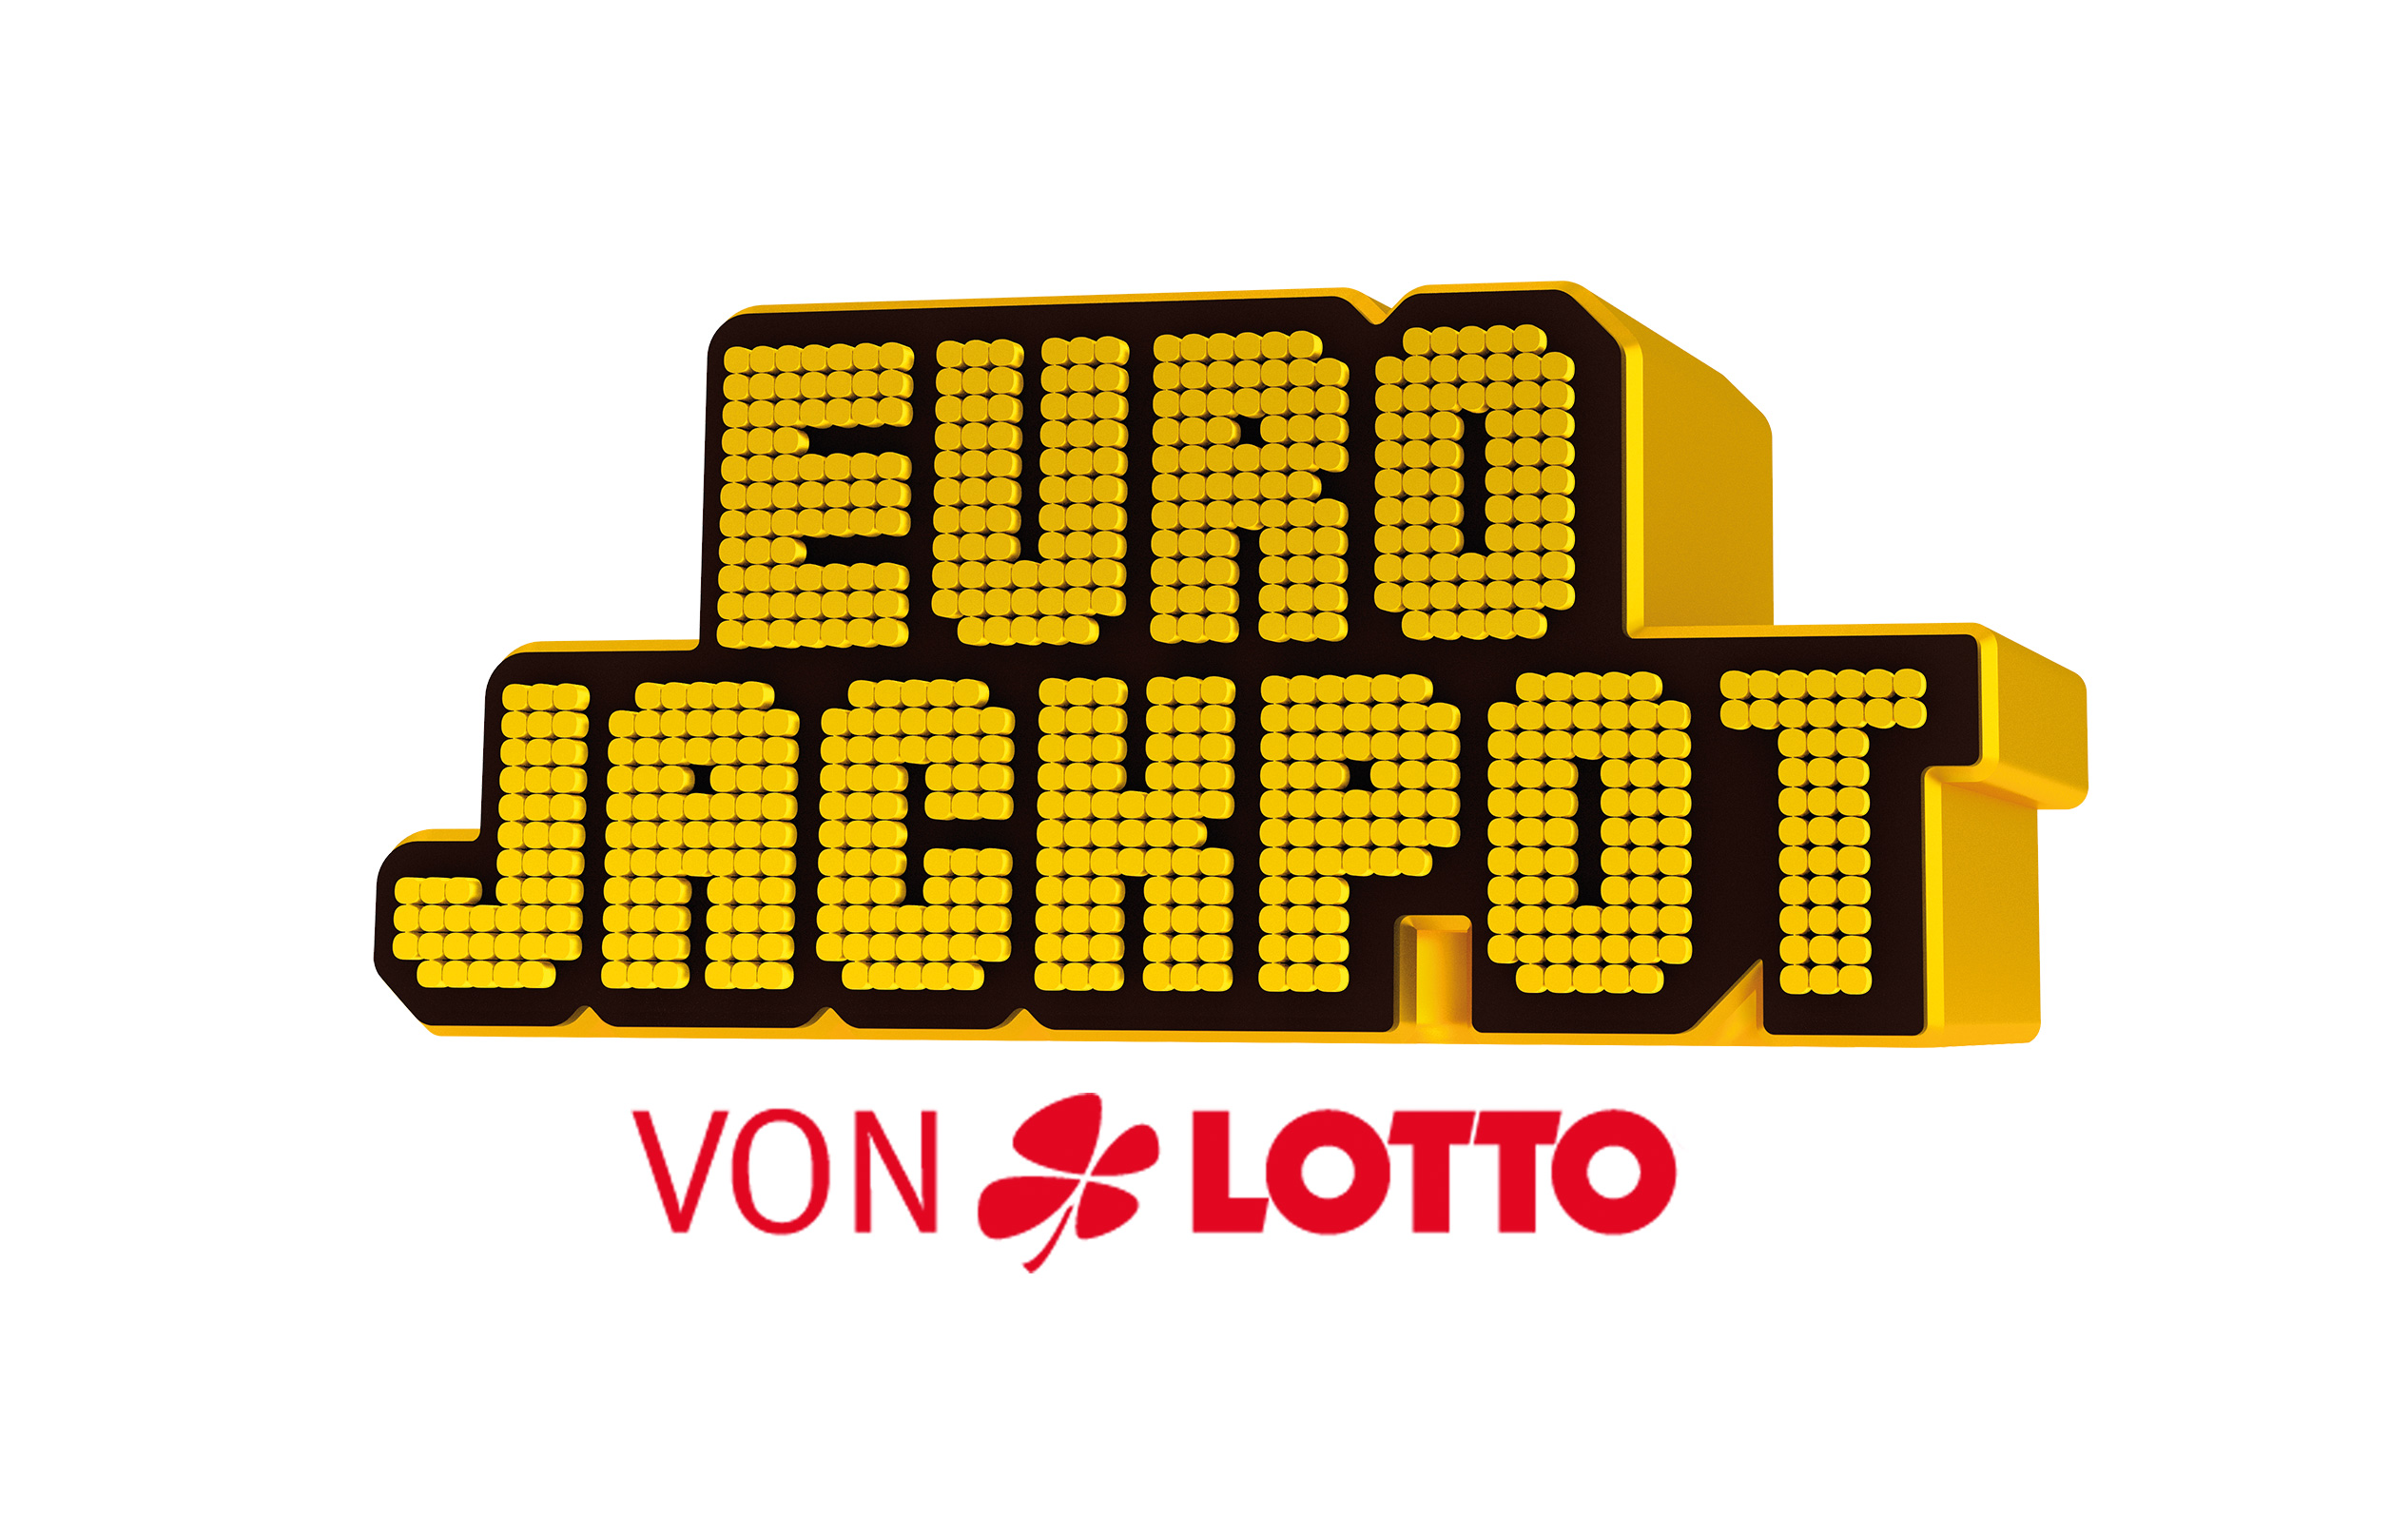 Eurojackpot Gewinnklasse 12 Gewinn